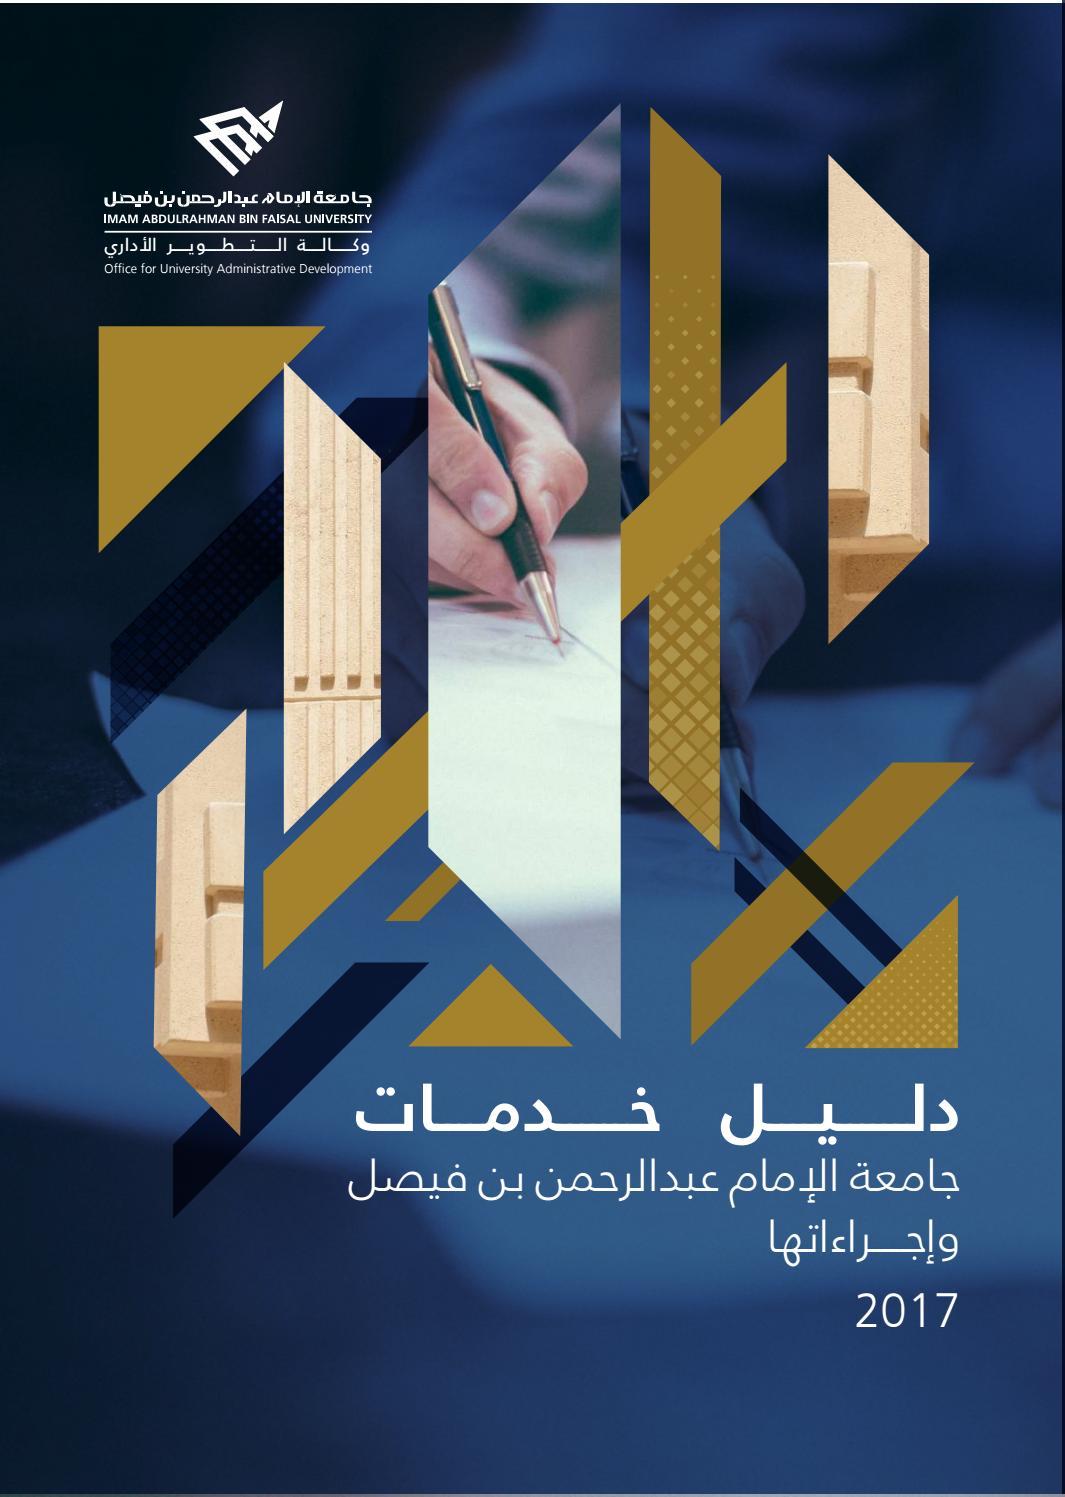 Iau S Services Procedures Guidebook 2017 By Imam Abdulrahman Bin